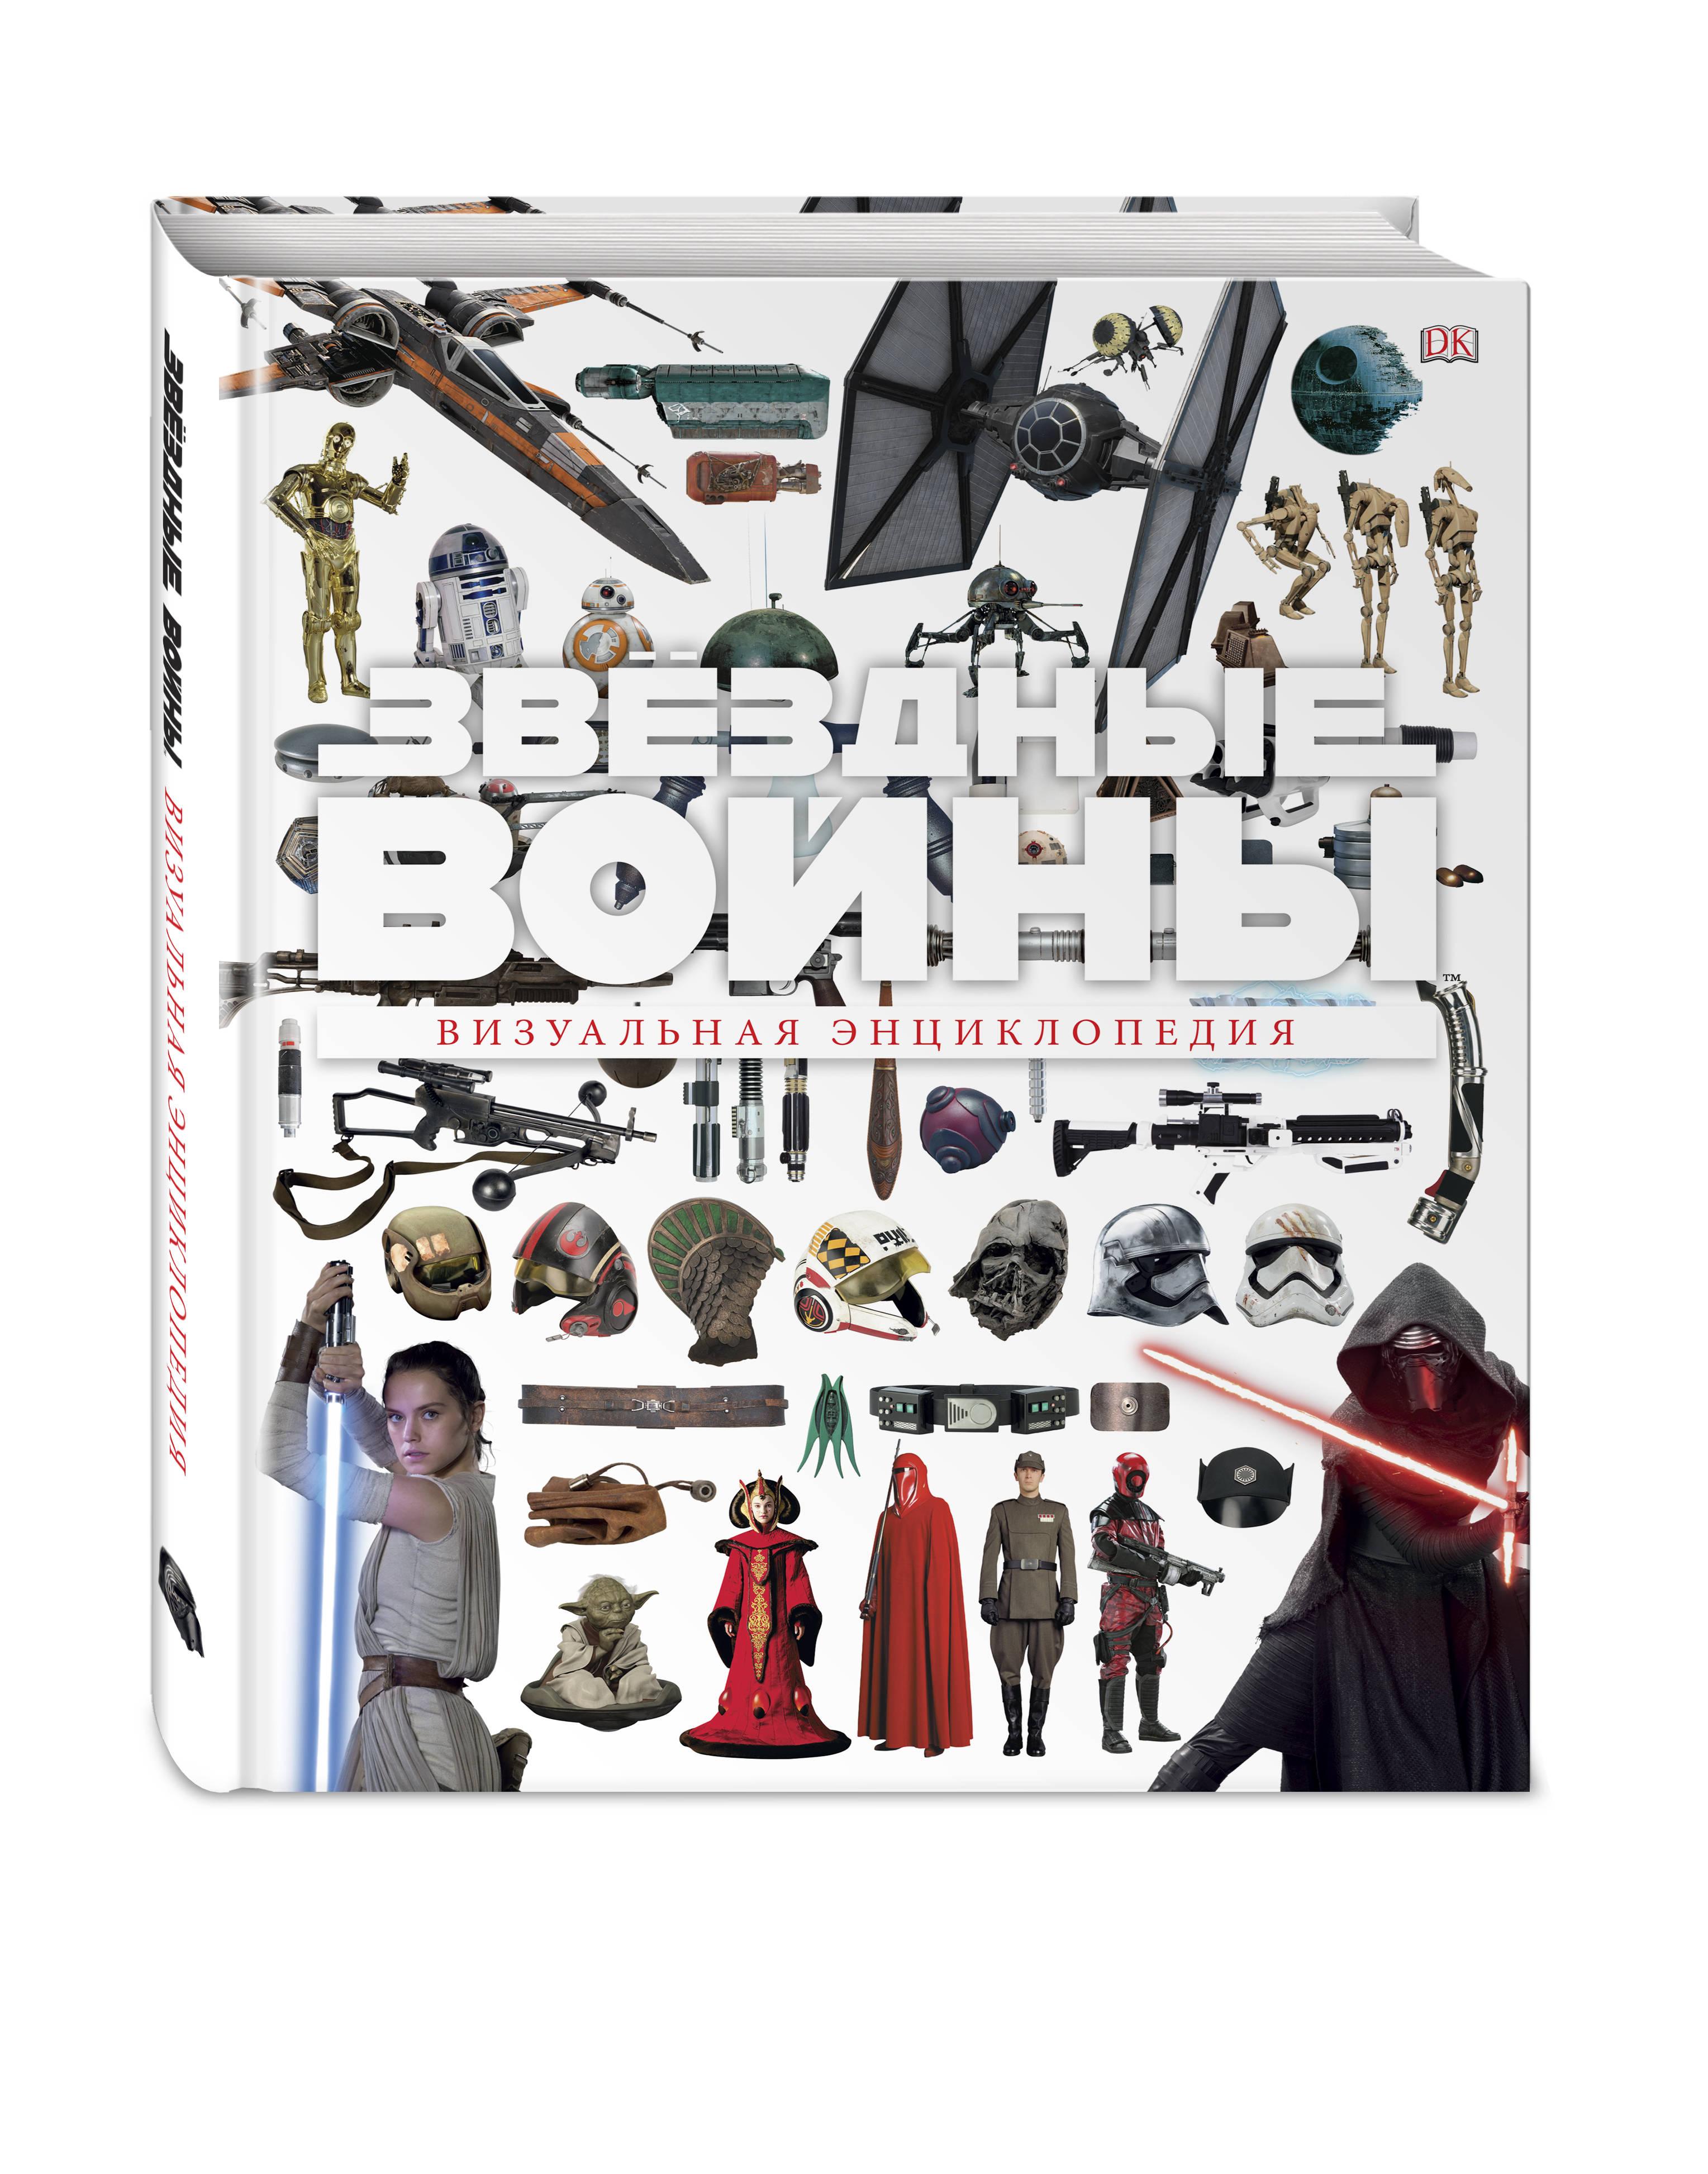 Звёздные Войны. Визуальная энциклопедия цены